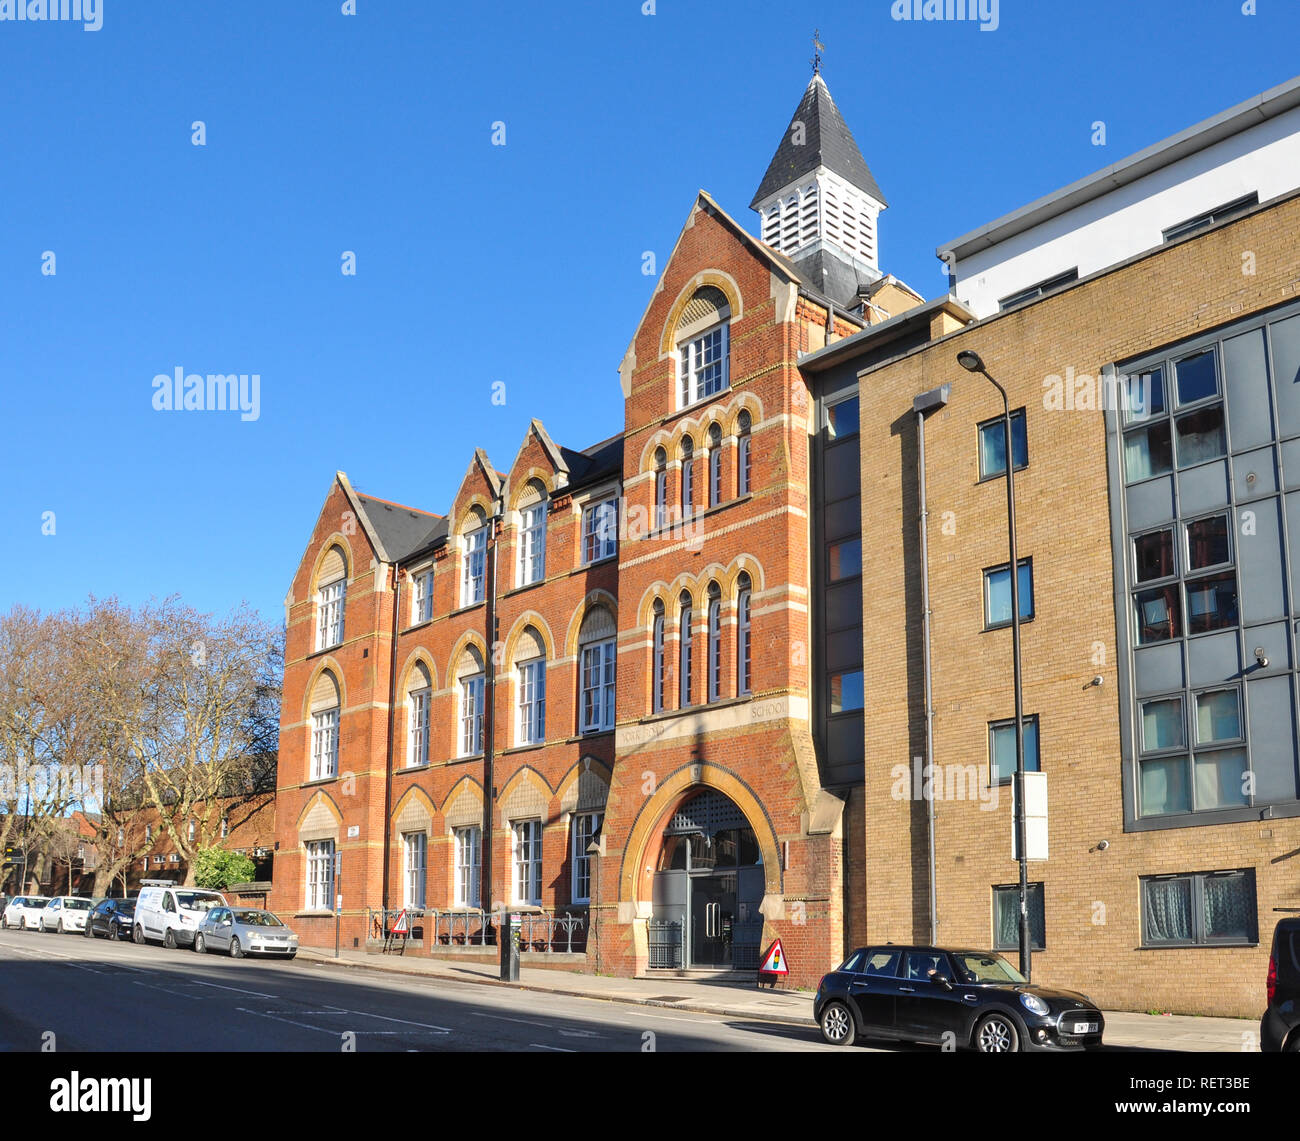 Refurbished old school building (formerly York Road School), York Way, King's Cross, London, England, UK - Stock Image